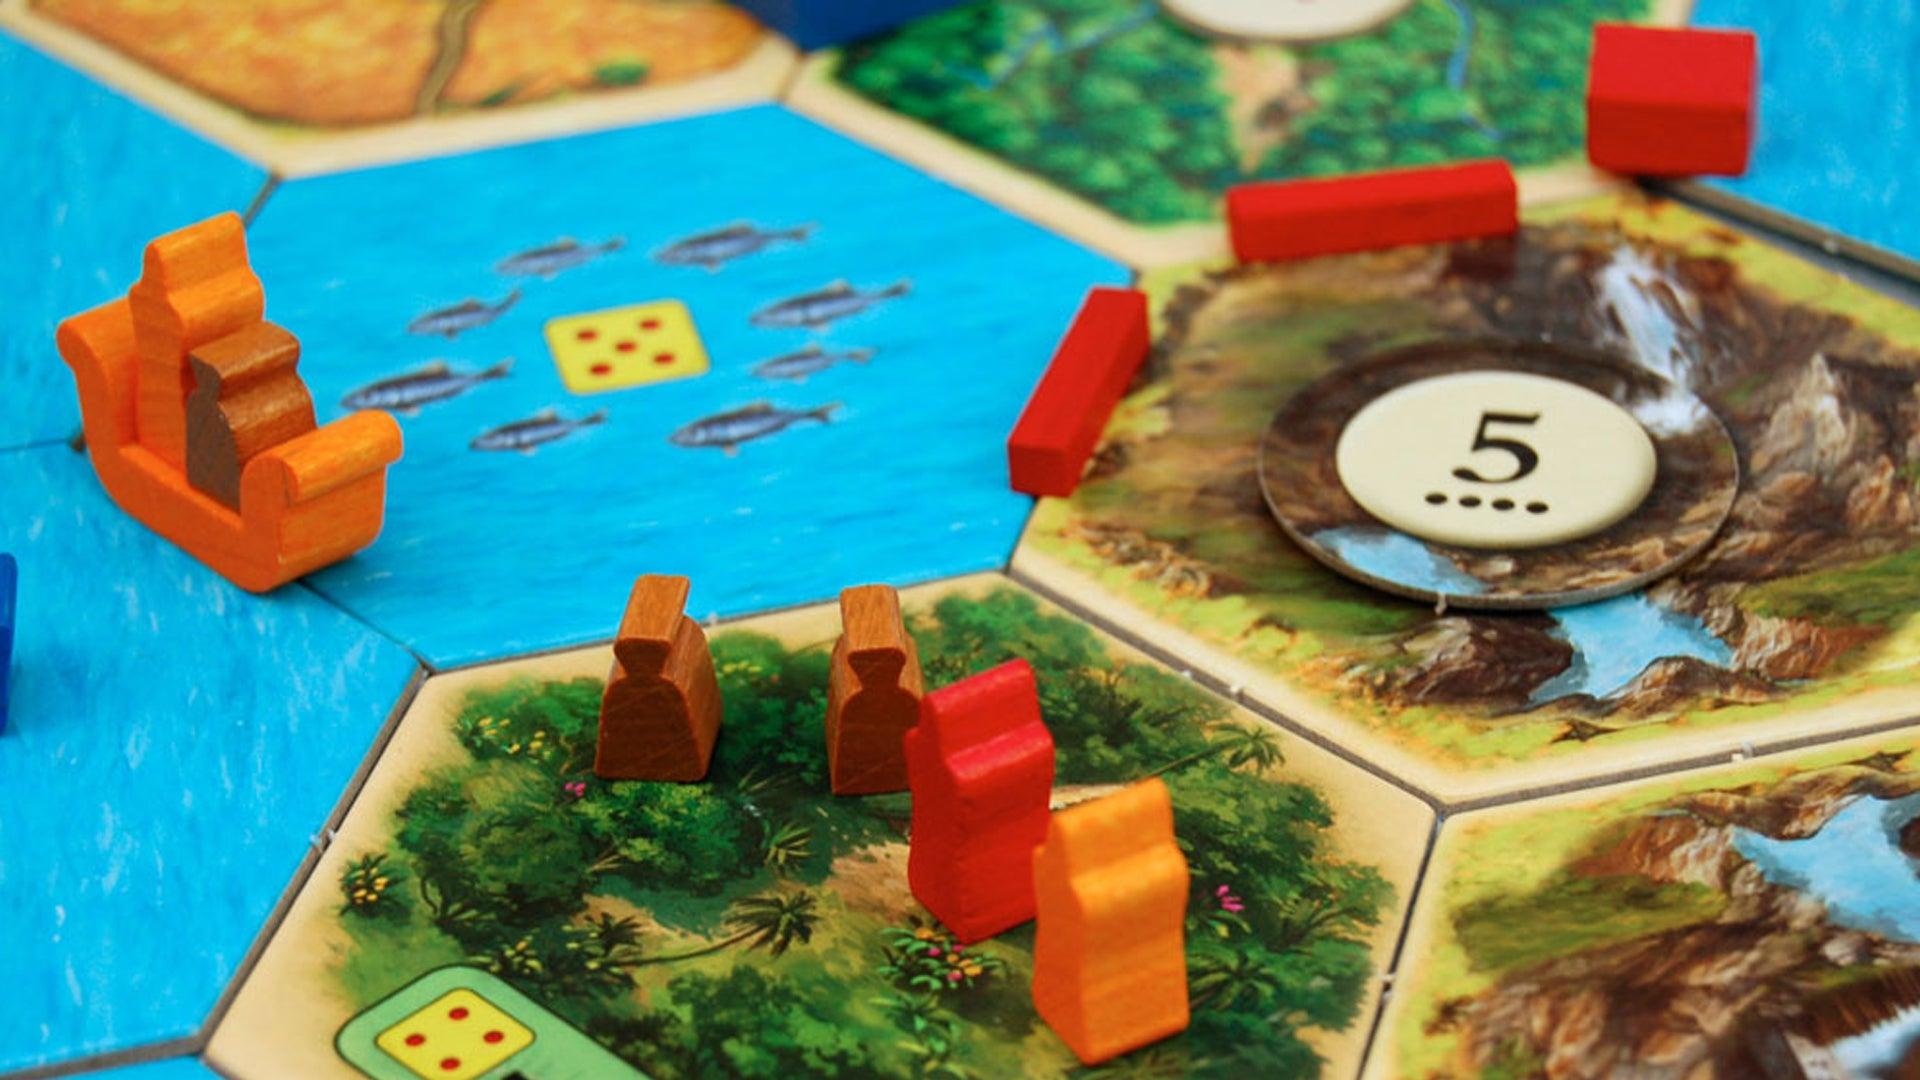 catan-explorers-and-pirates-expansion-gameplay.jpg